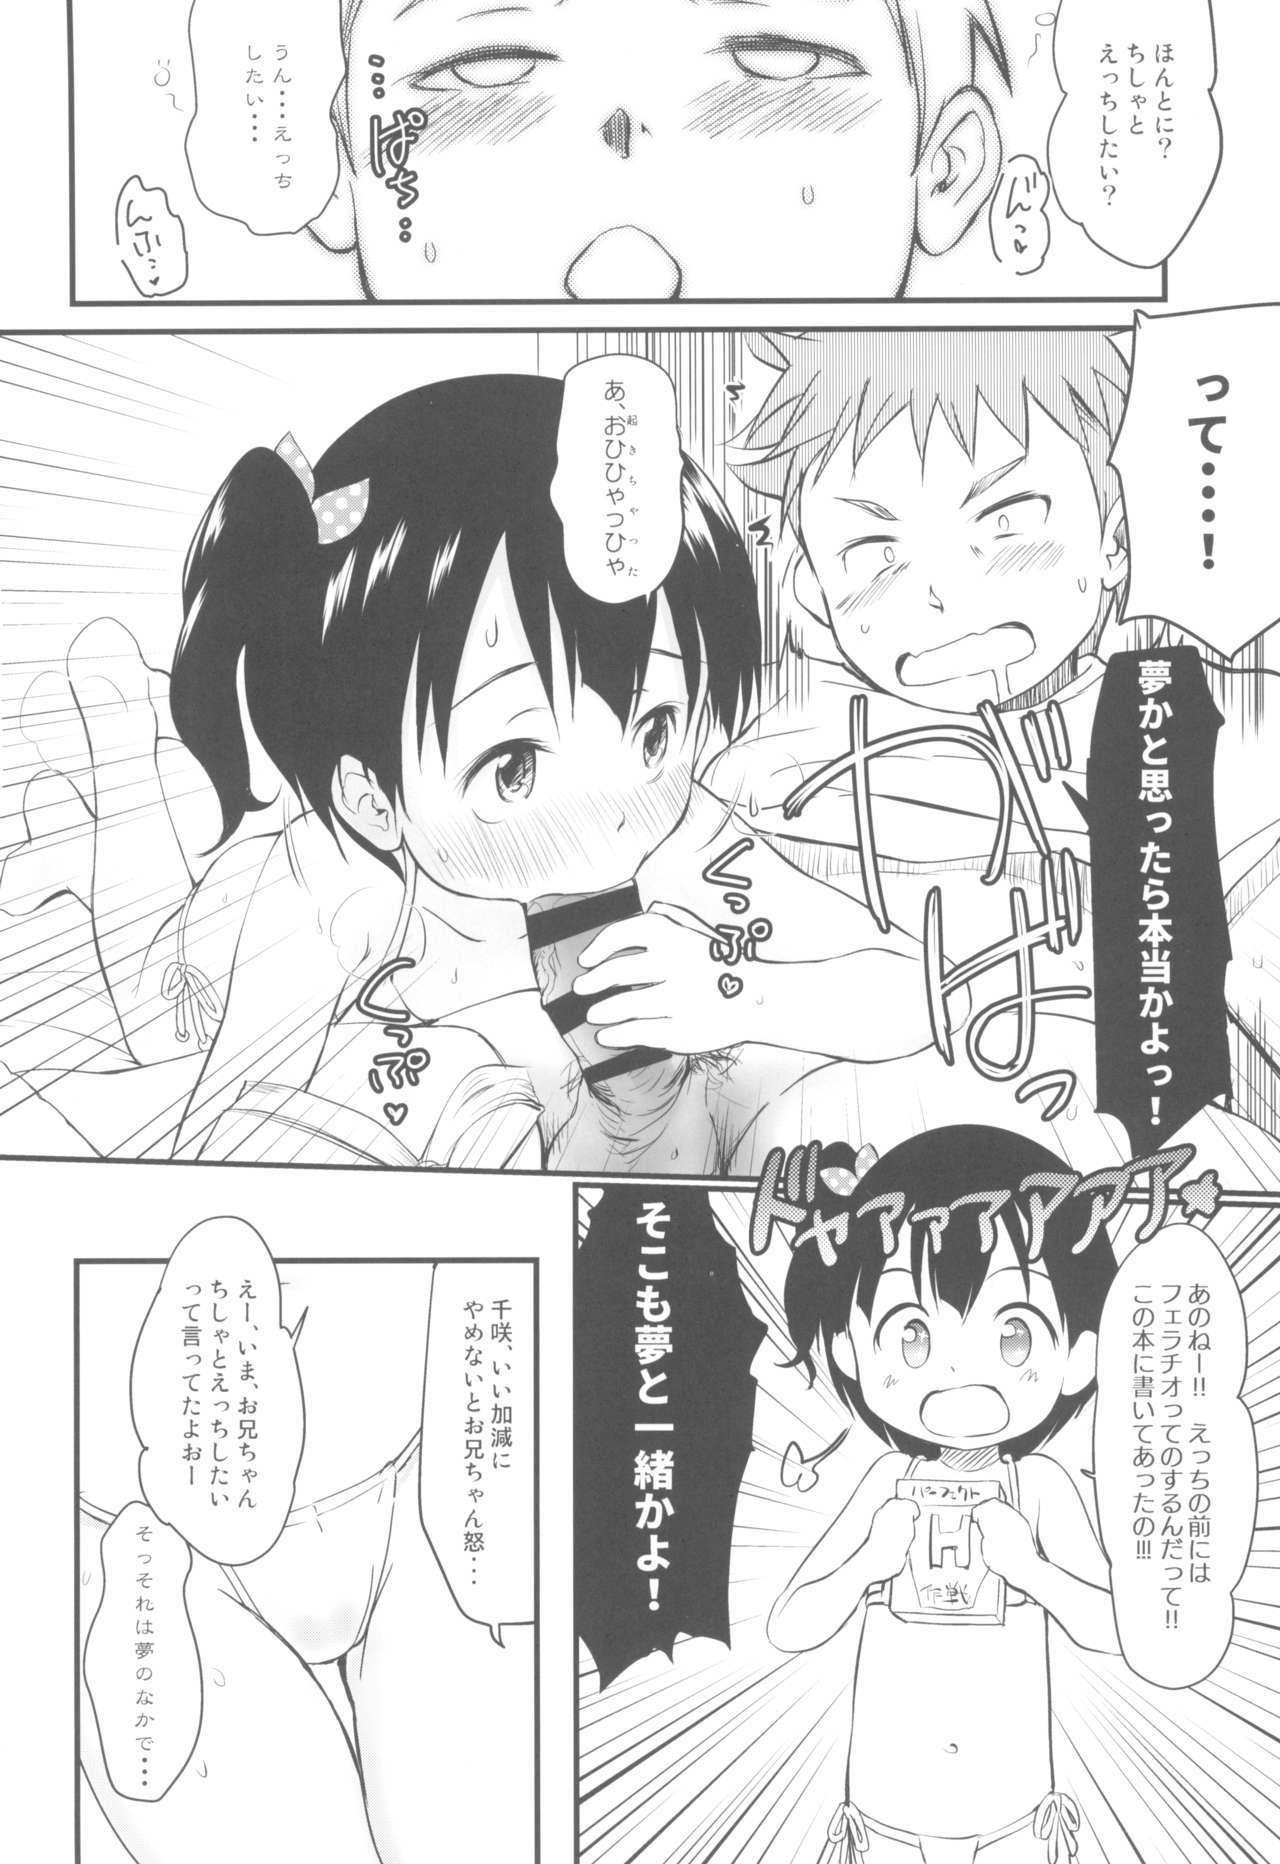 (C97) [Wancho-ke (Wancho)] Imouto wa Minna Onii-chan ga Suki! 5-Kaiteiban- 11